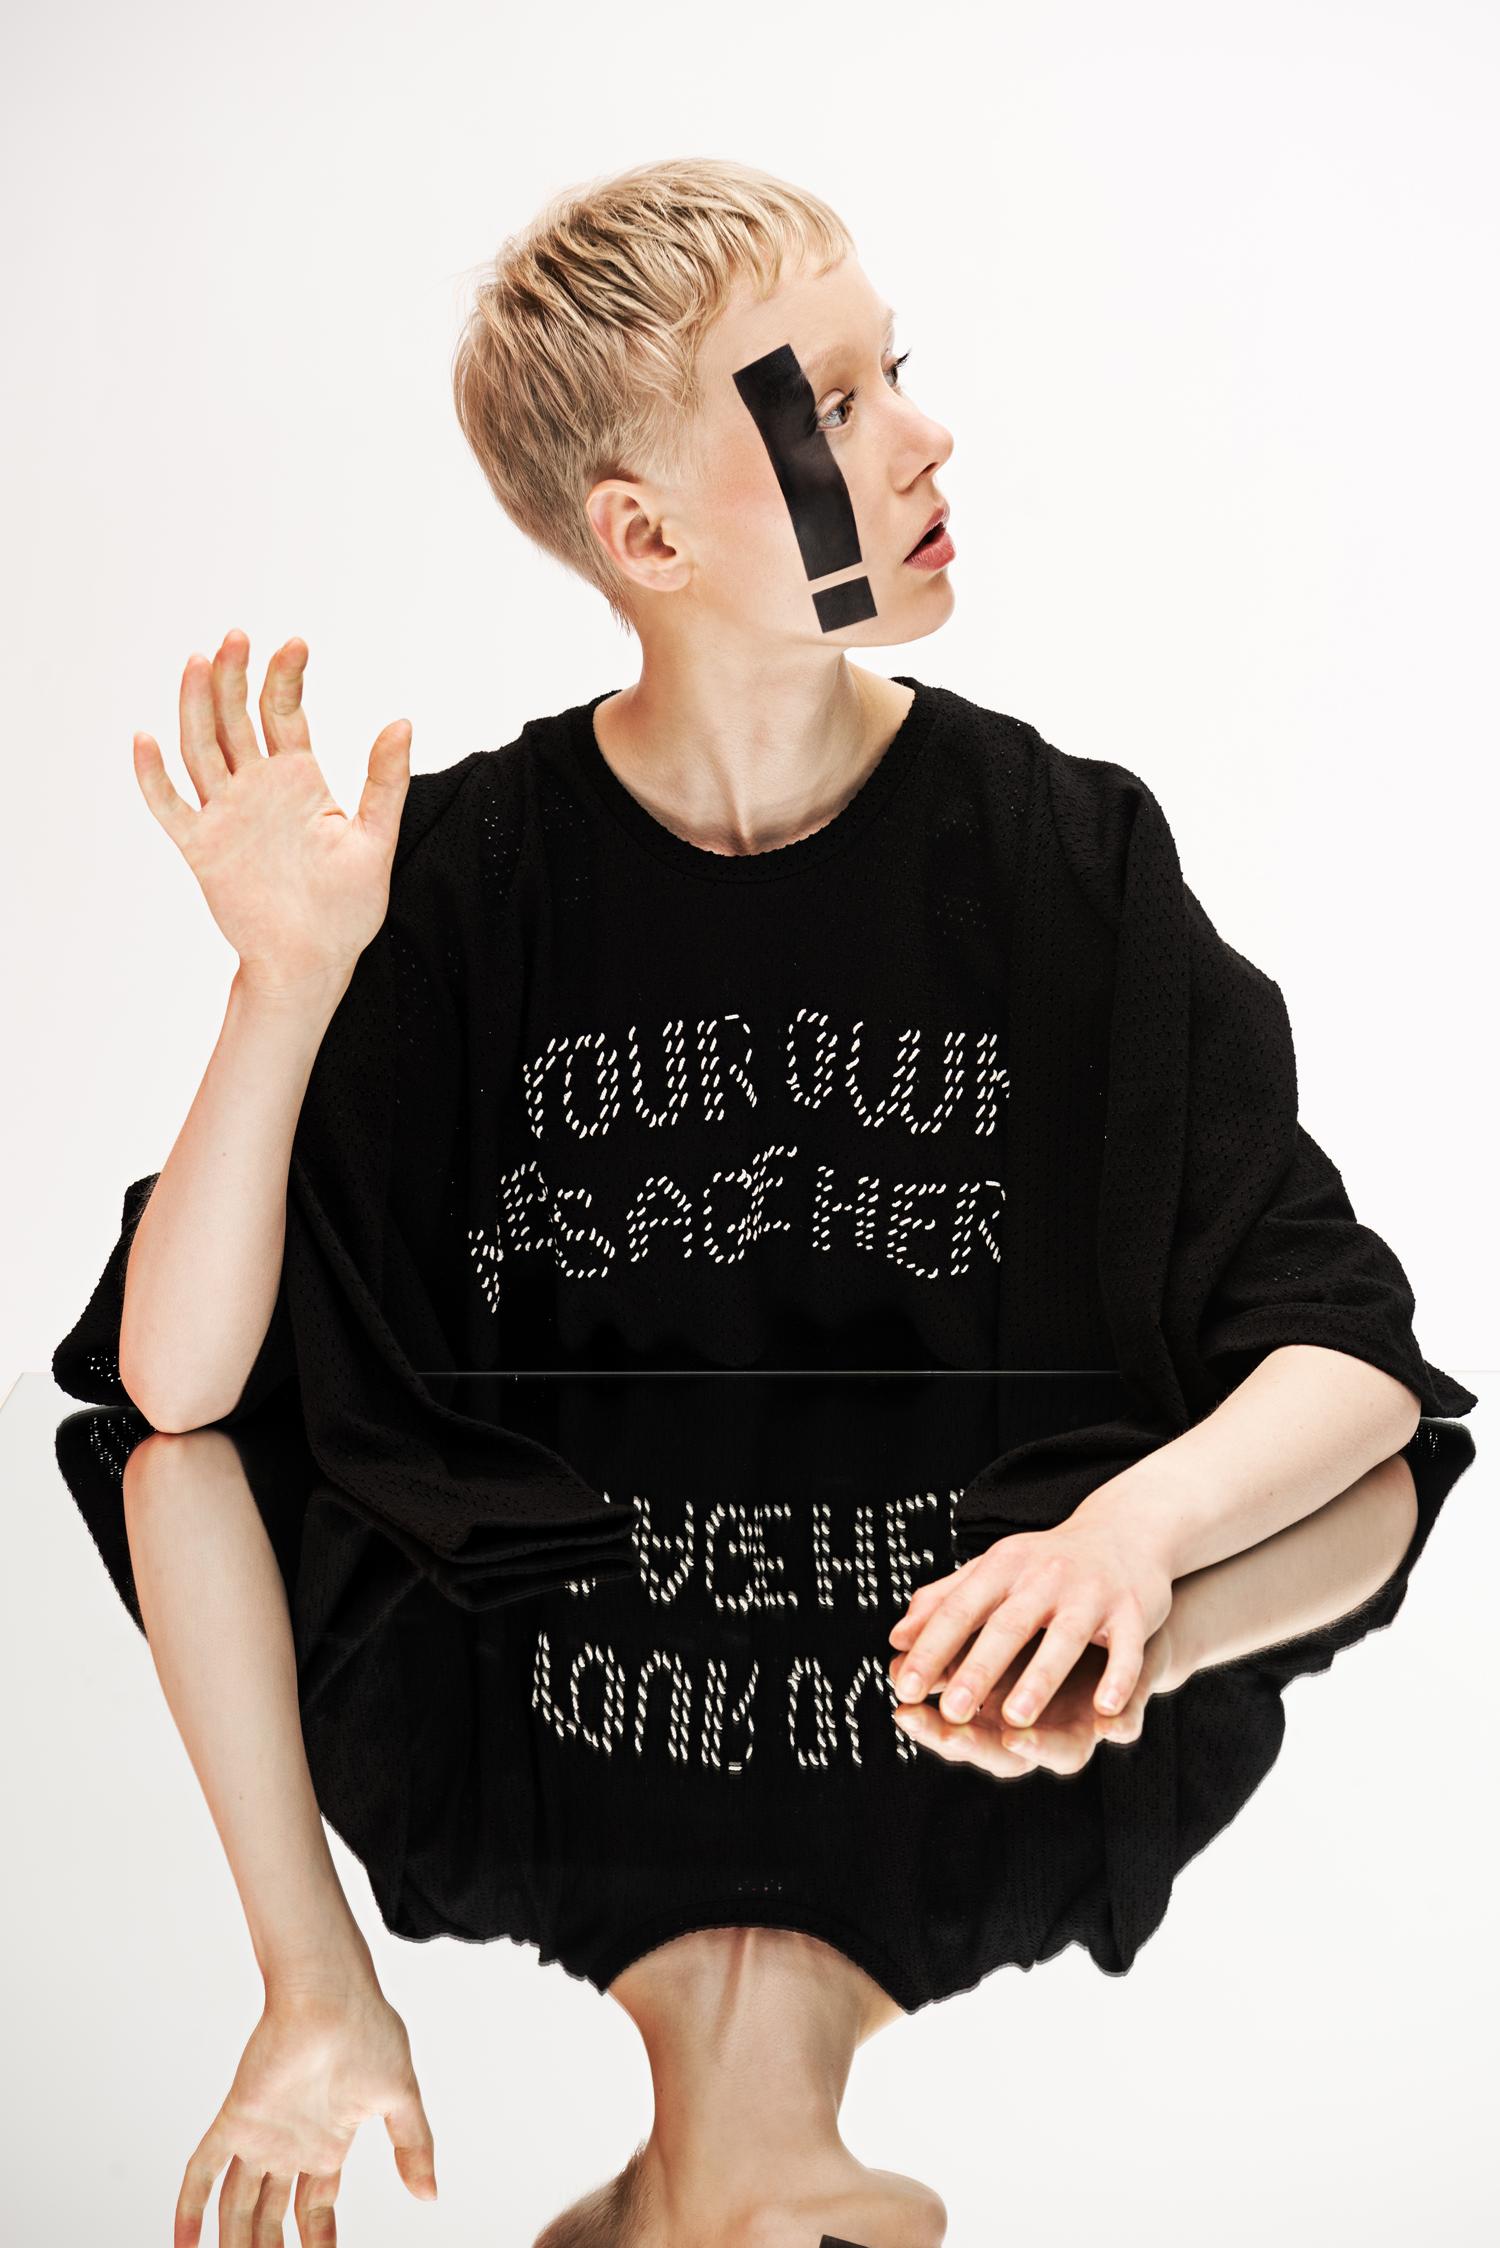 Valokuvat: Sara Lehtomaa / Studio Fotonokka @saralehtomaa Mallit: Maria & Alo / Modelpoint @modelpointmodels, Maria @mariahelinae Alo @alo_leon_ )Make-up & Hair: Meliina Savela @meliinasavela